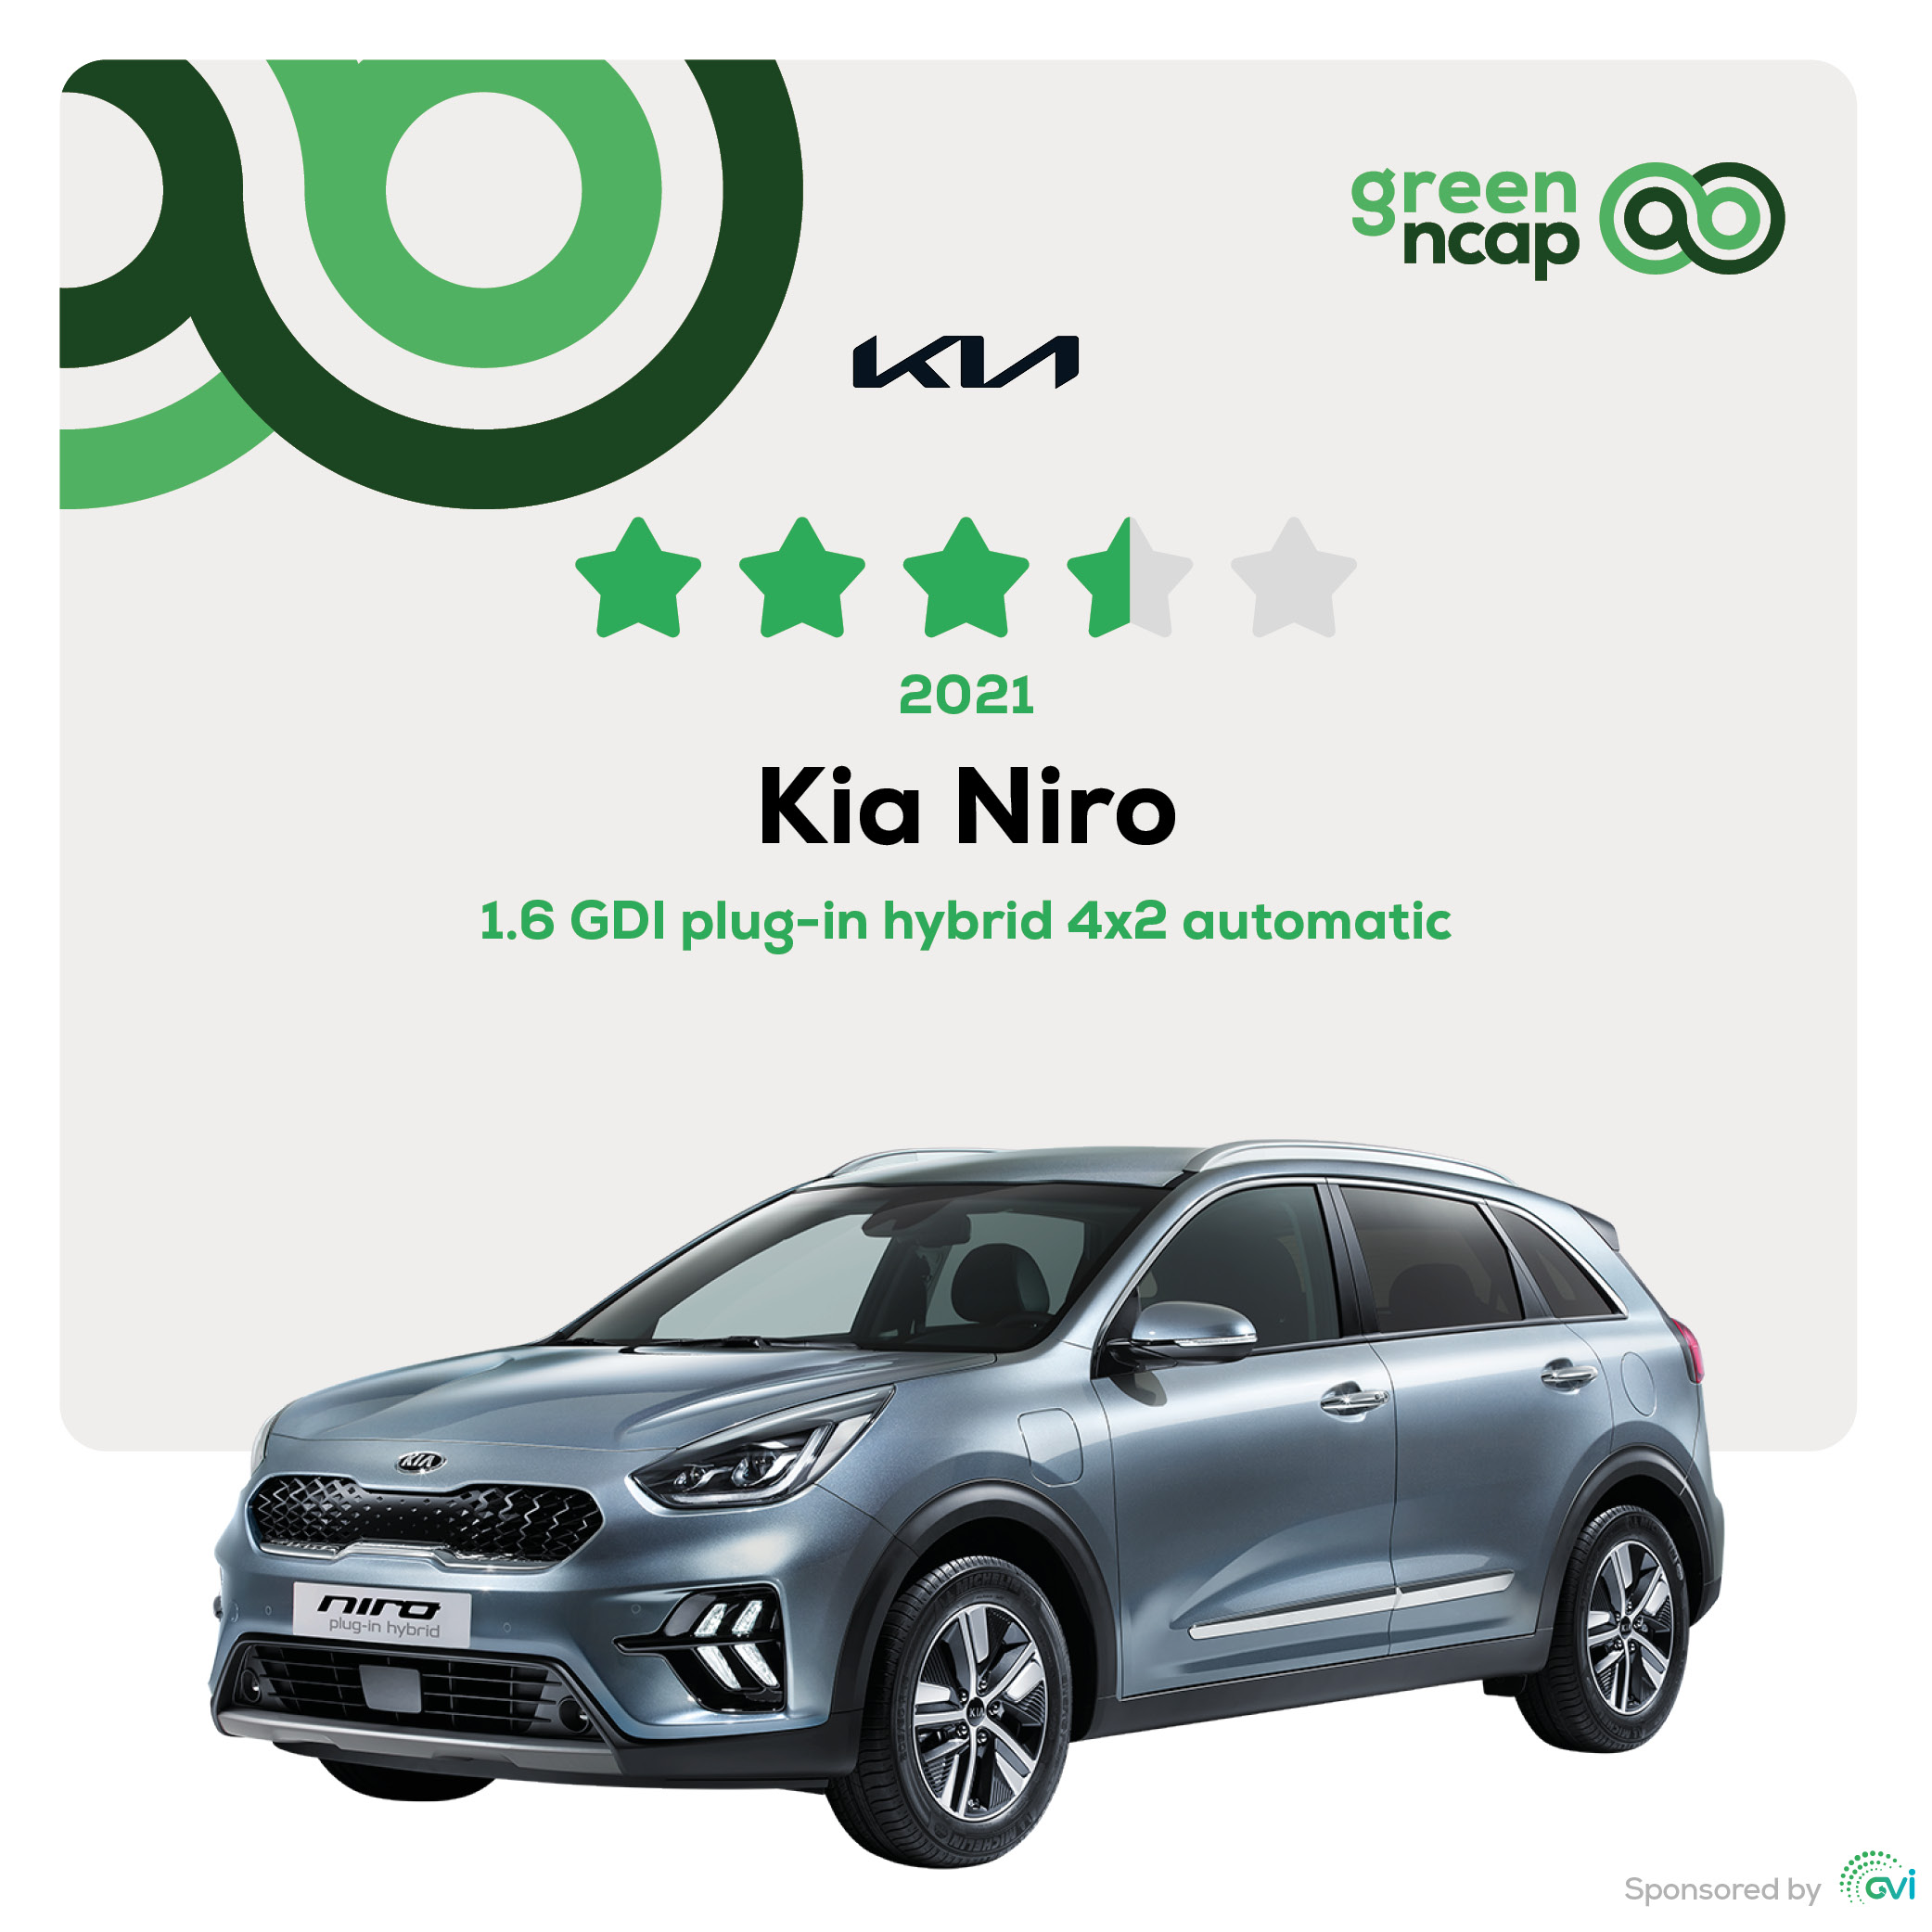 Kia Niro - Green NCAP Results February 2021 - 3½ stars